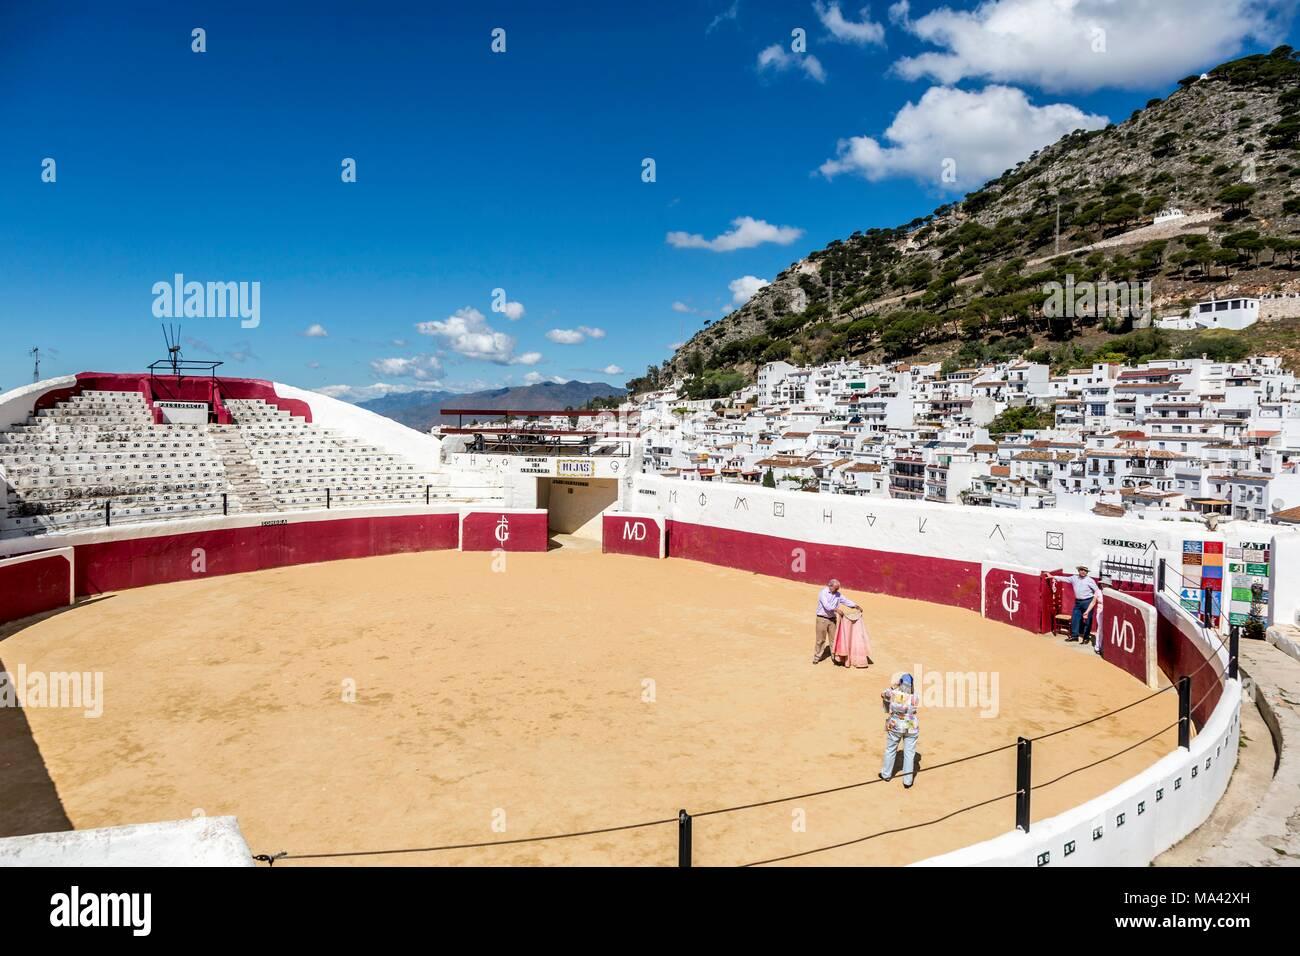 The bull fighting arena in Mijas Pueblo, Andalusia (Spain